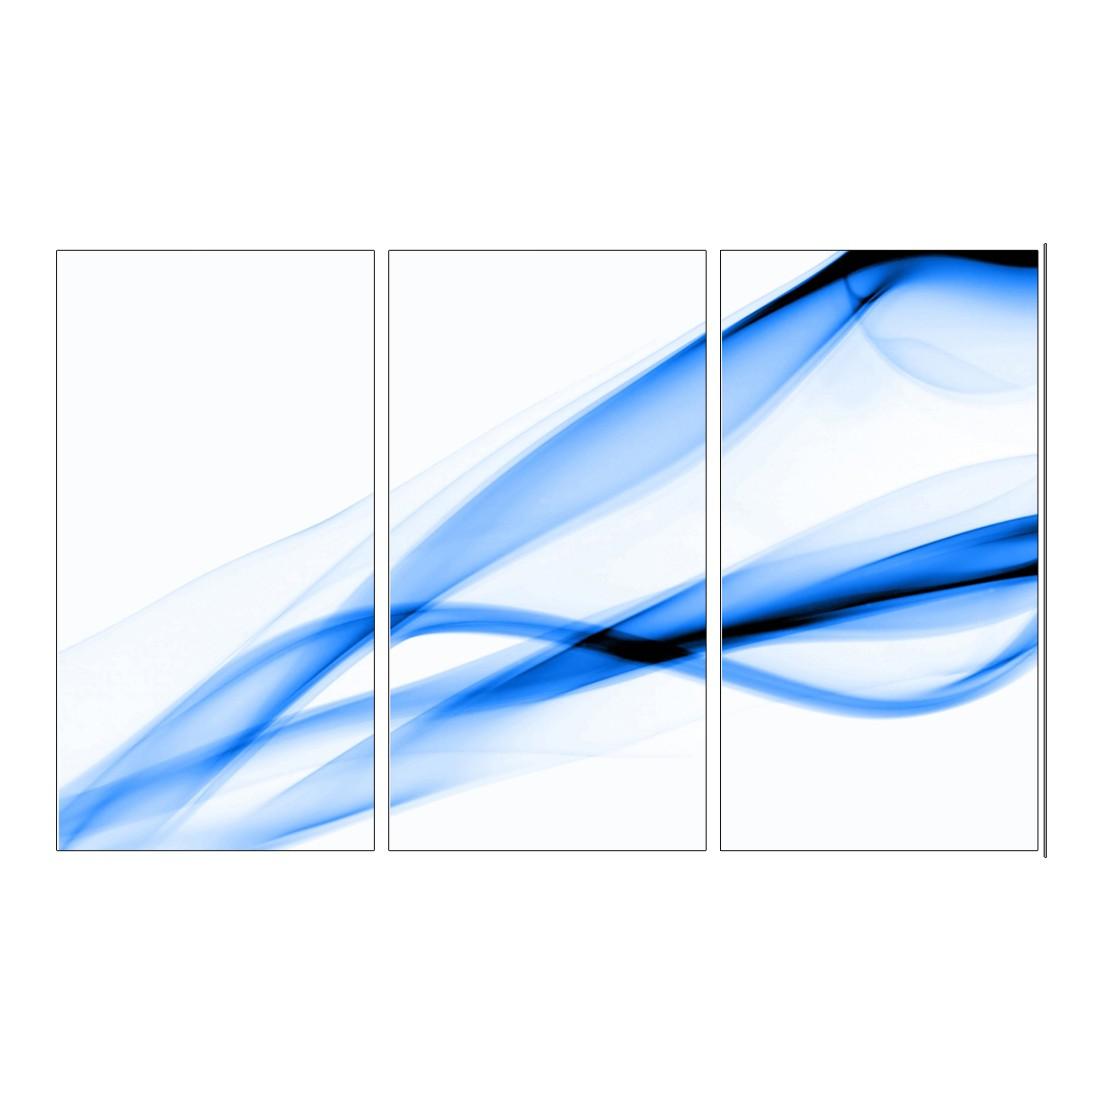 Leinwandbild Abstrakt Blau – 120 x 80cm, Gallery of Innovative Art günstig